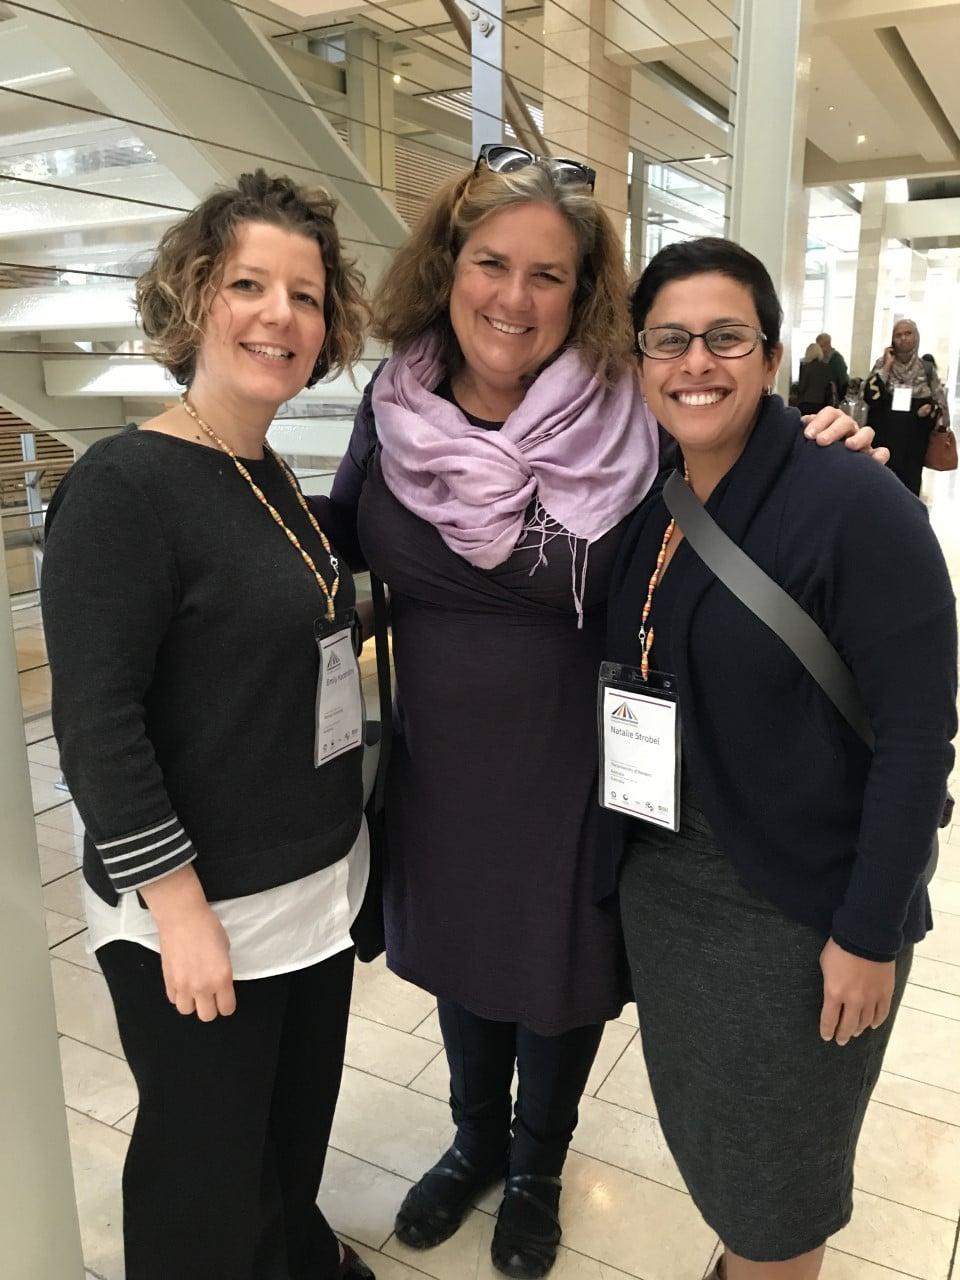 Three Australian delegates at the Global Evidence Summit: Emily Karahalios, Cath Chamberlain and Natalie Strobel.